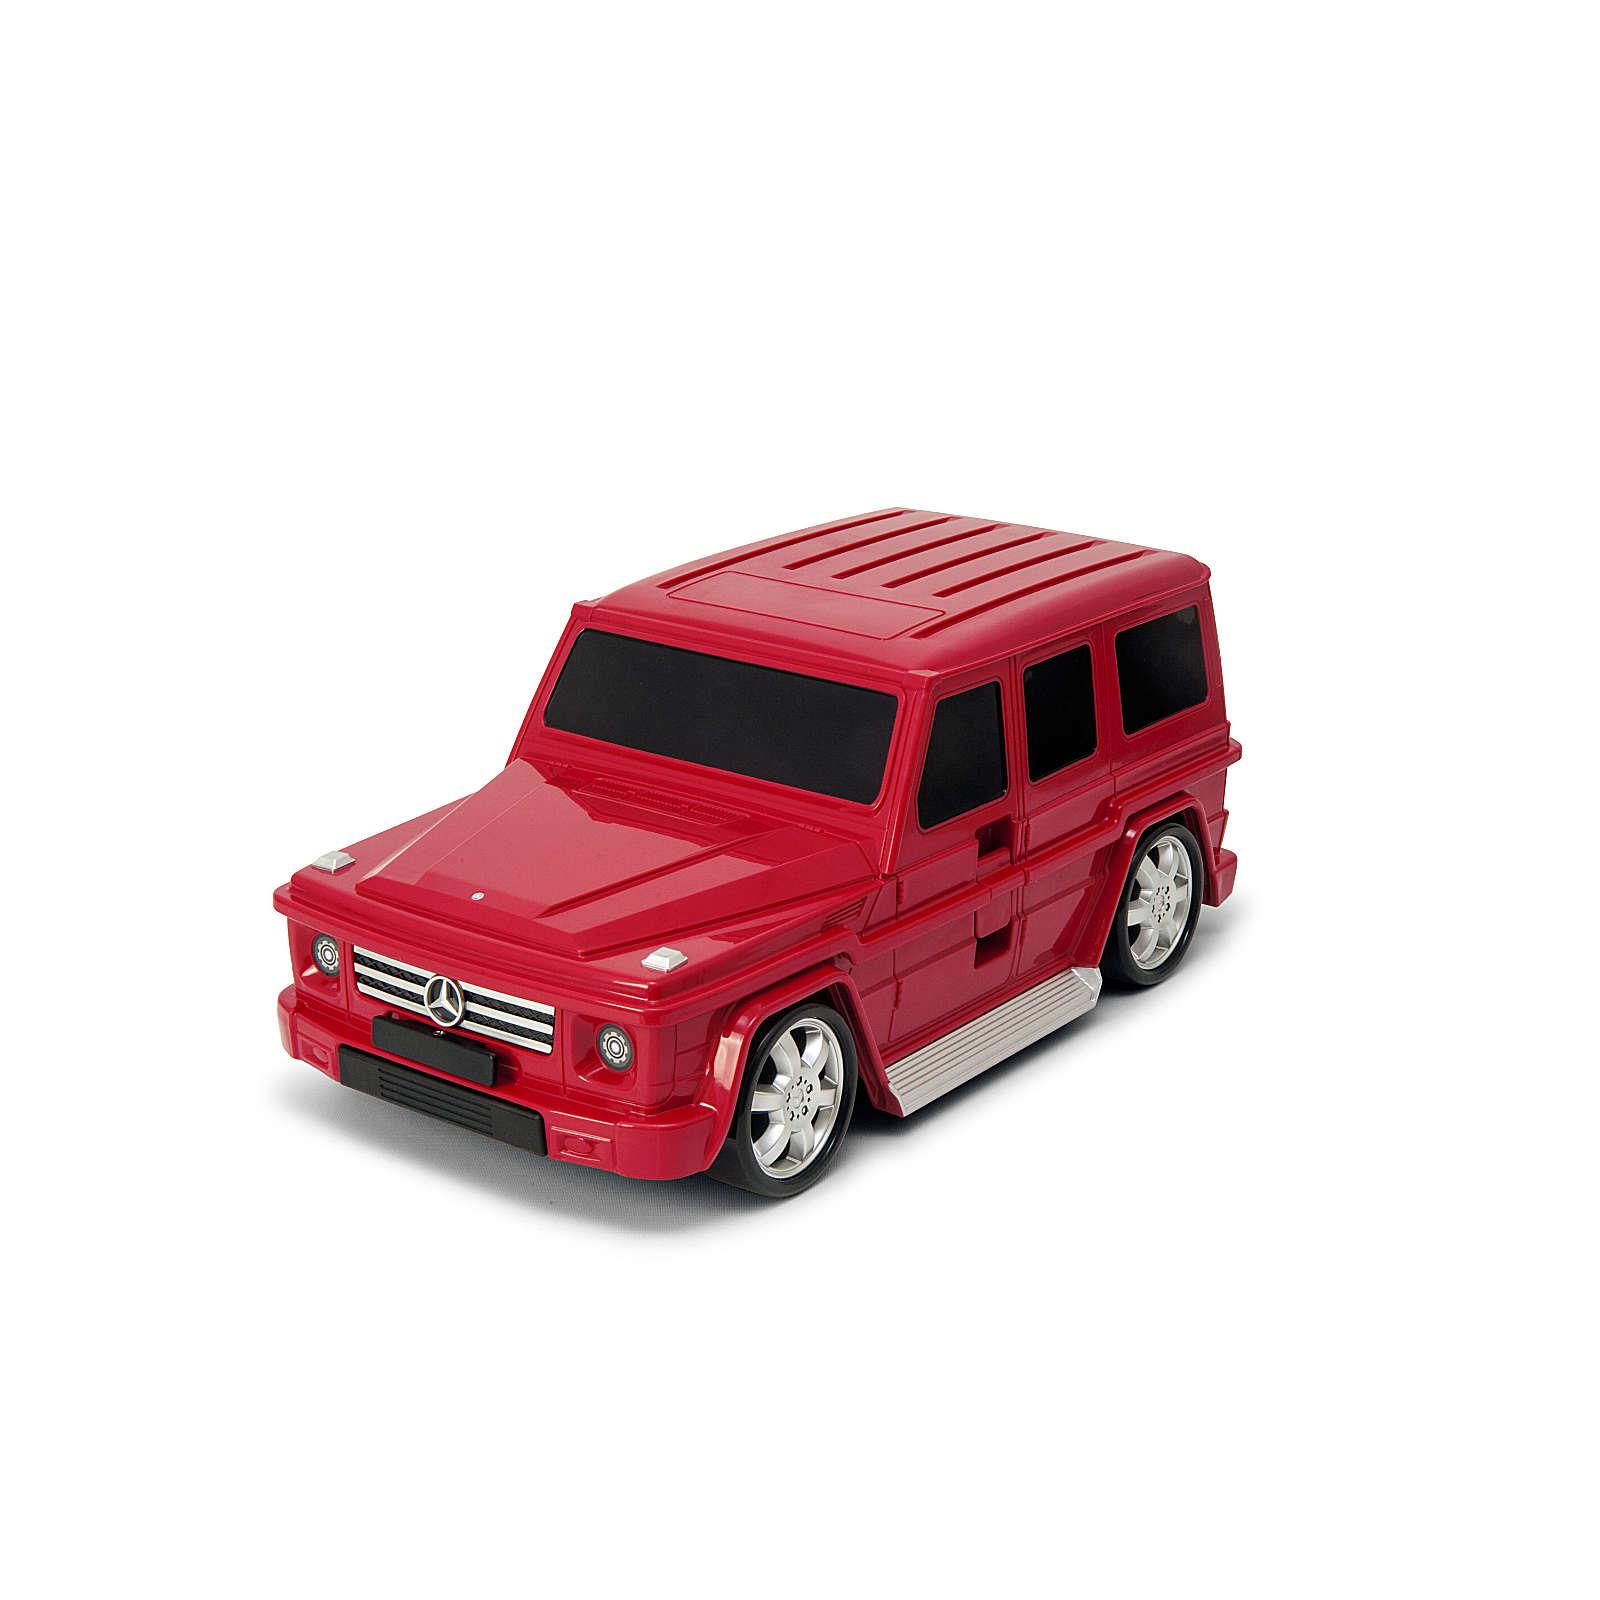 Packenger Kinderkoffer Kinderauto Kindertrolley G63 rot